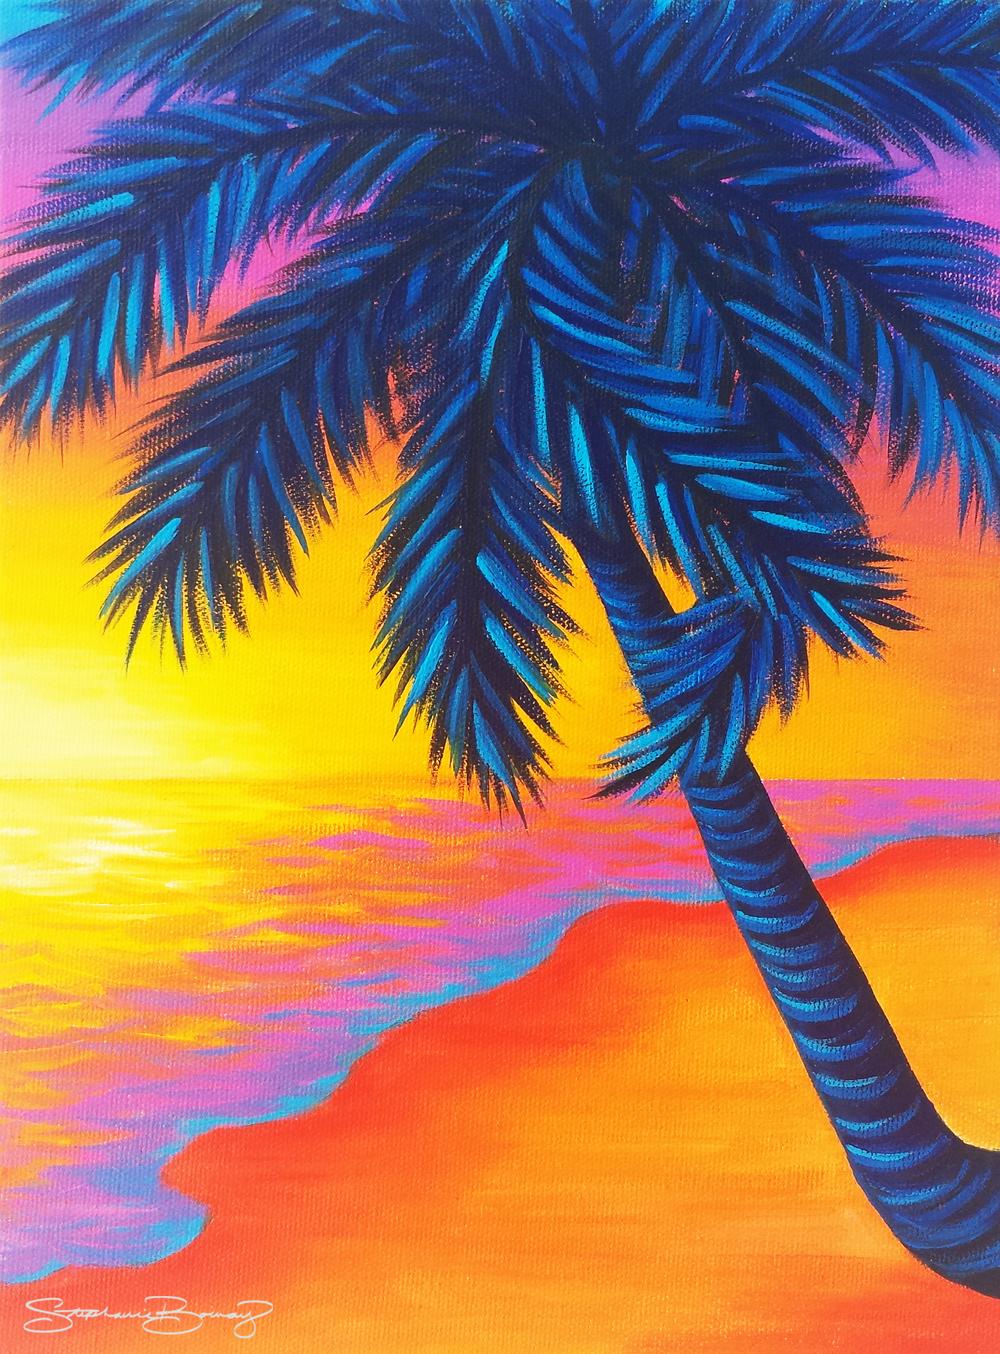 Blue Palm Sunset No. 2